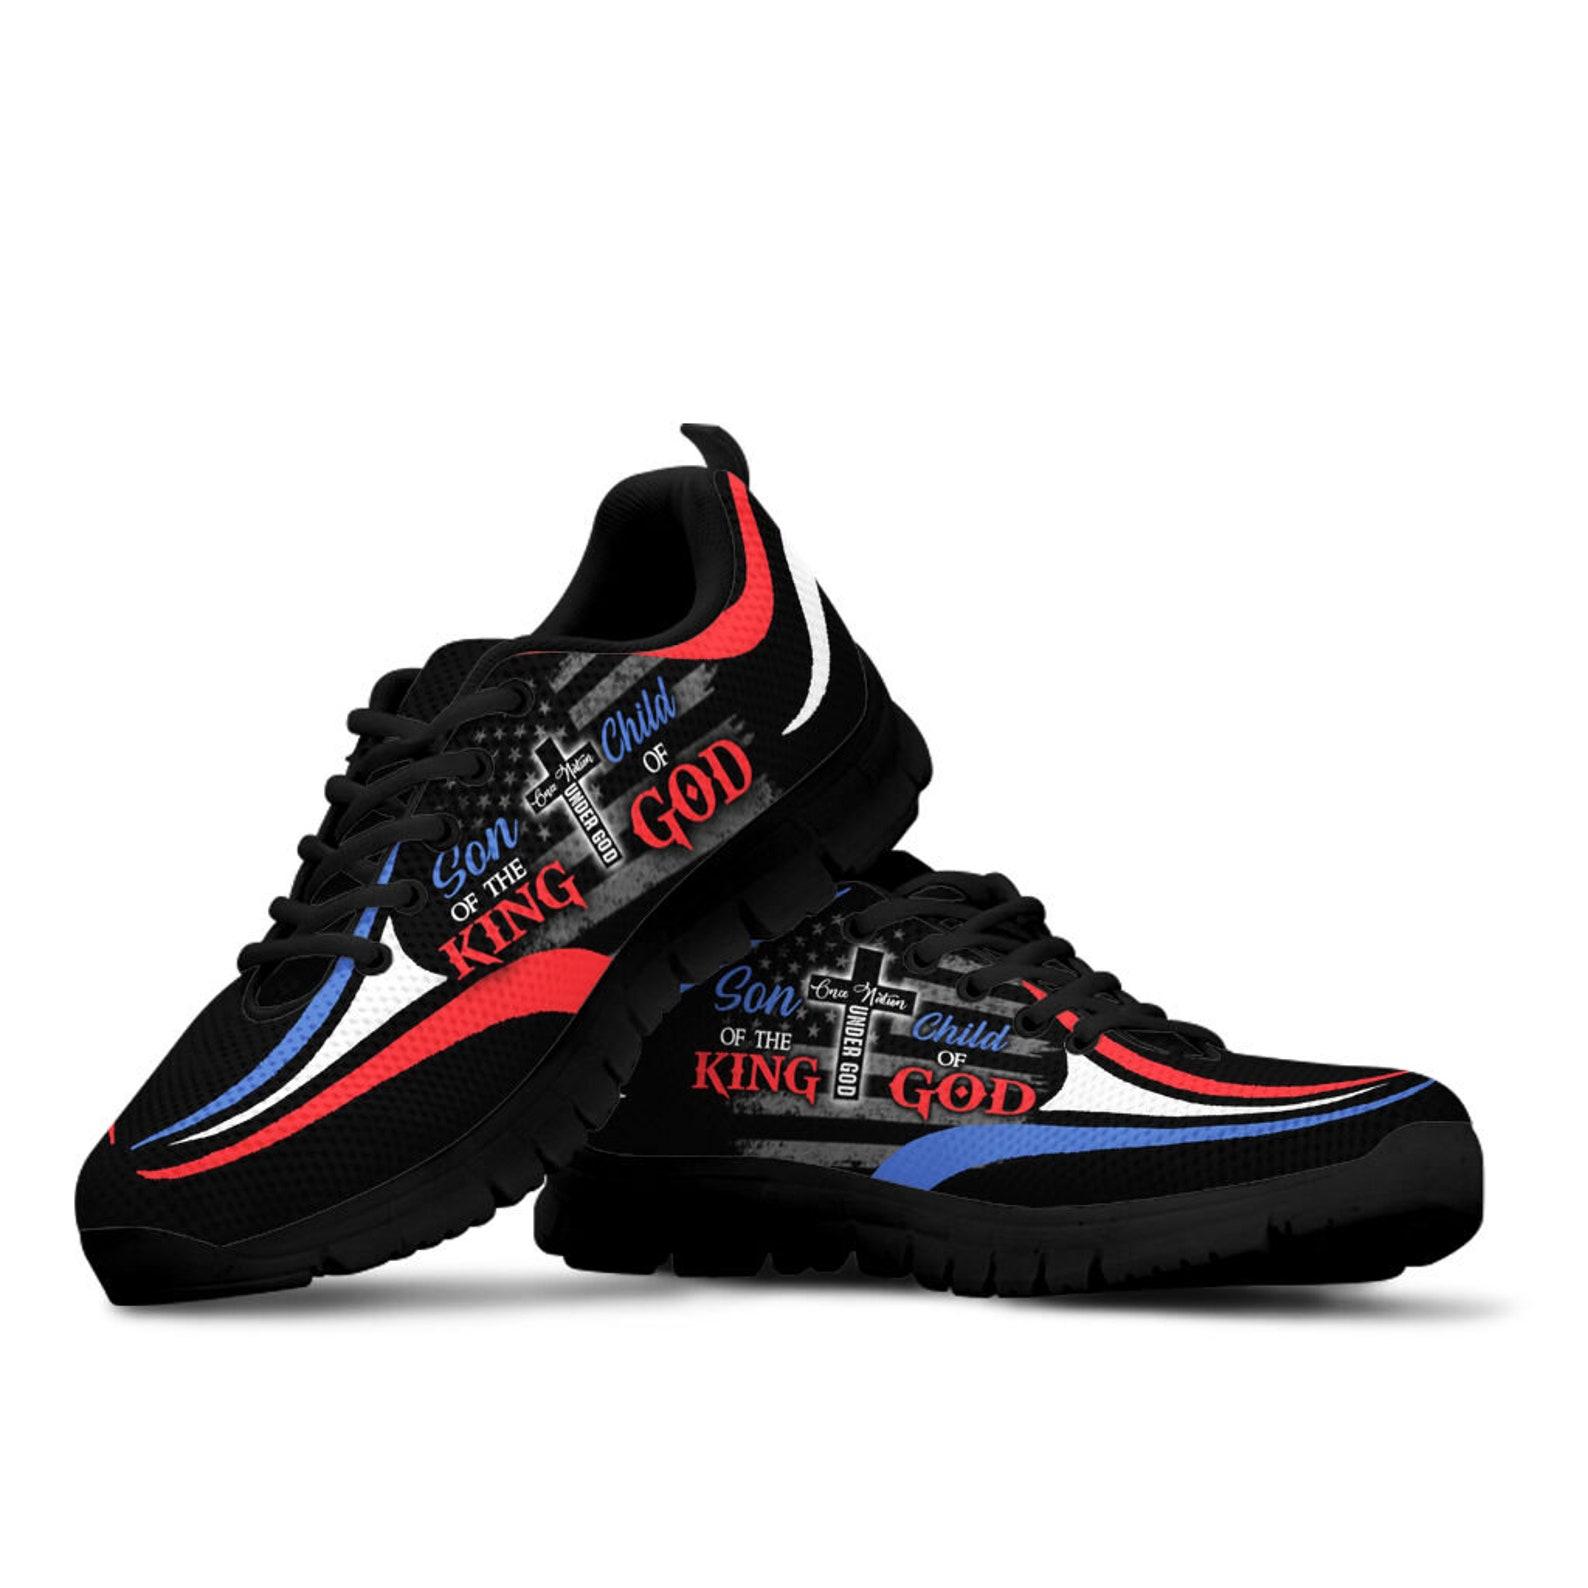 Sohn des KönigsKind Gottes Sneaker Casual Best Custom | Etsy